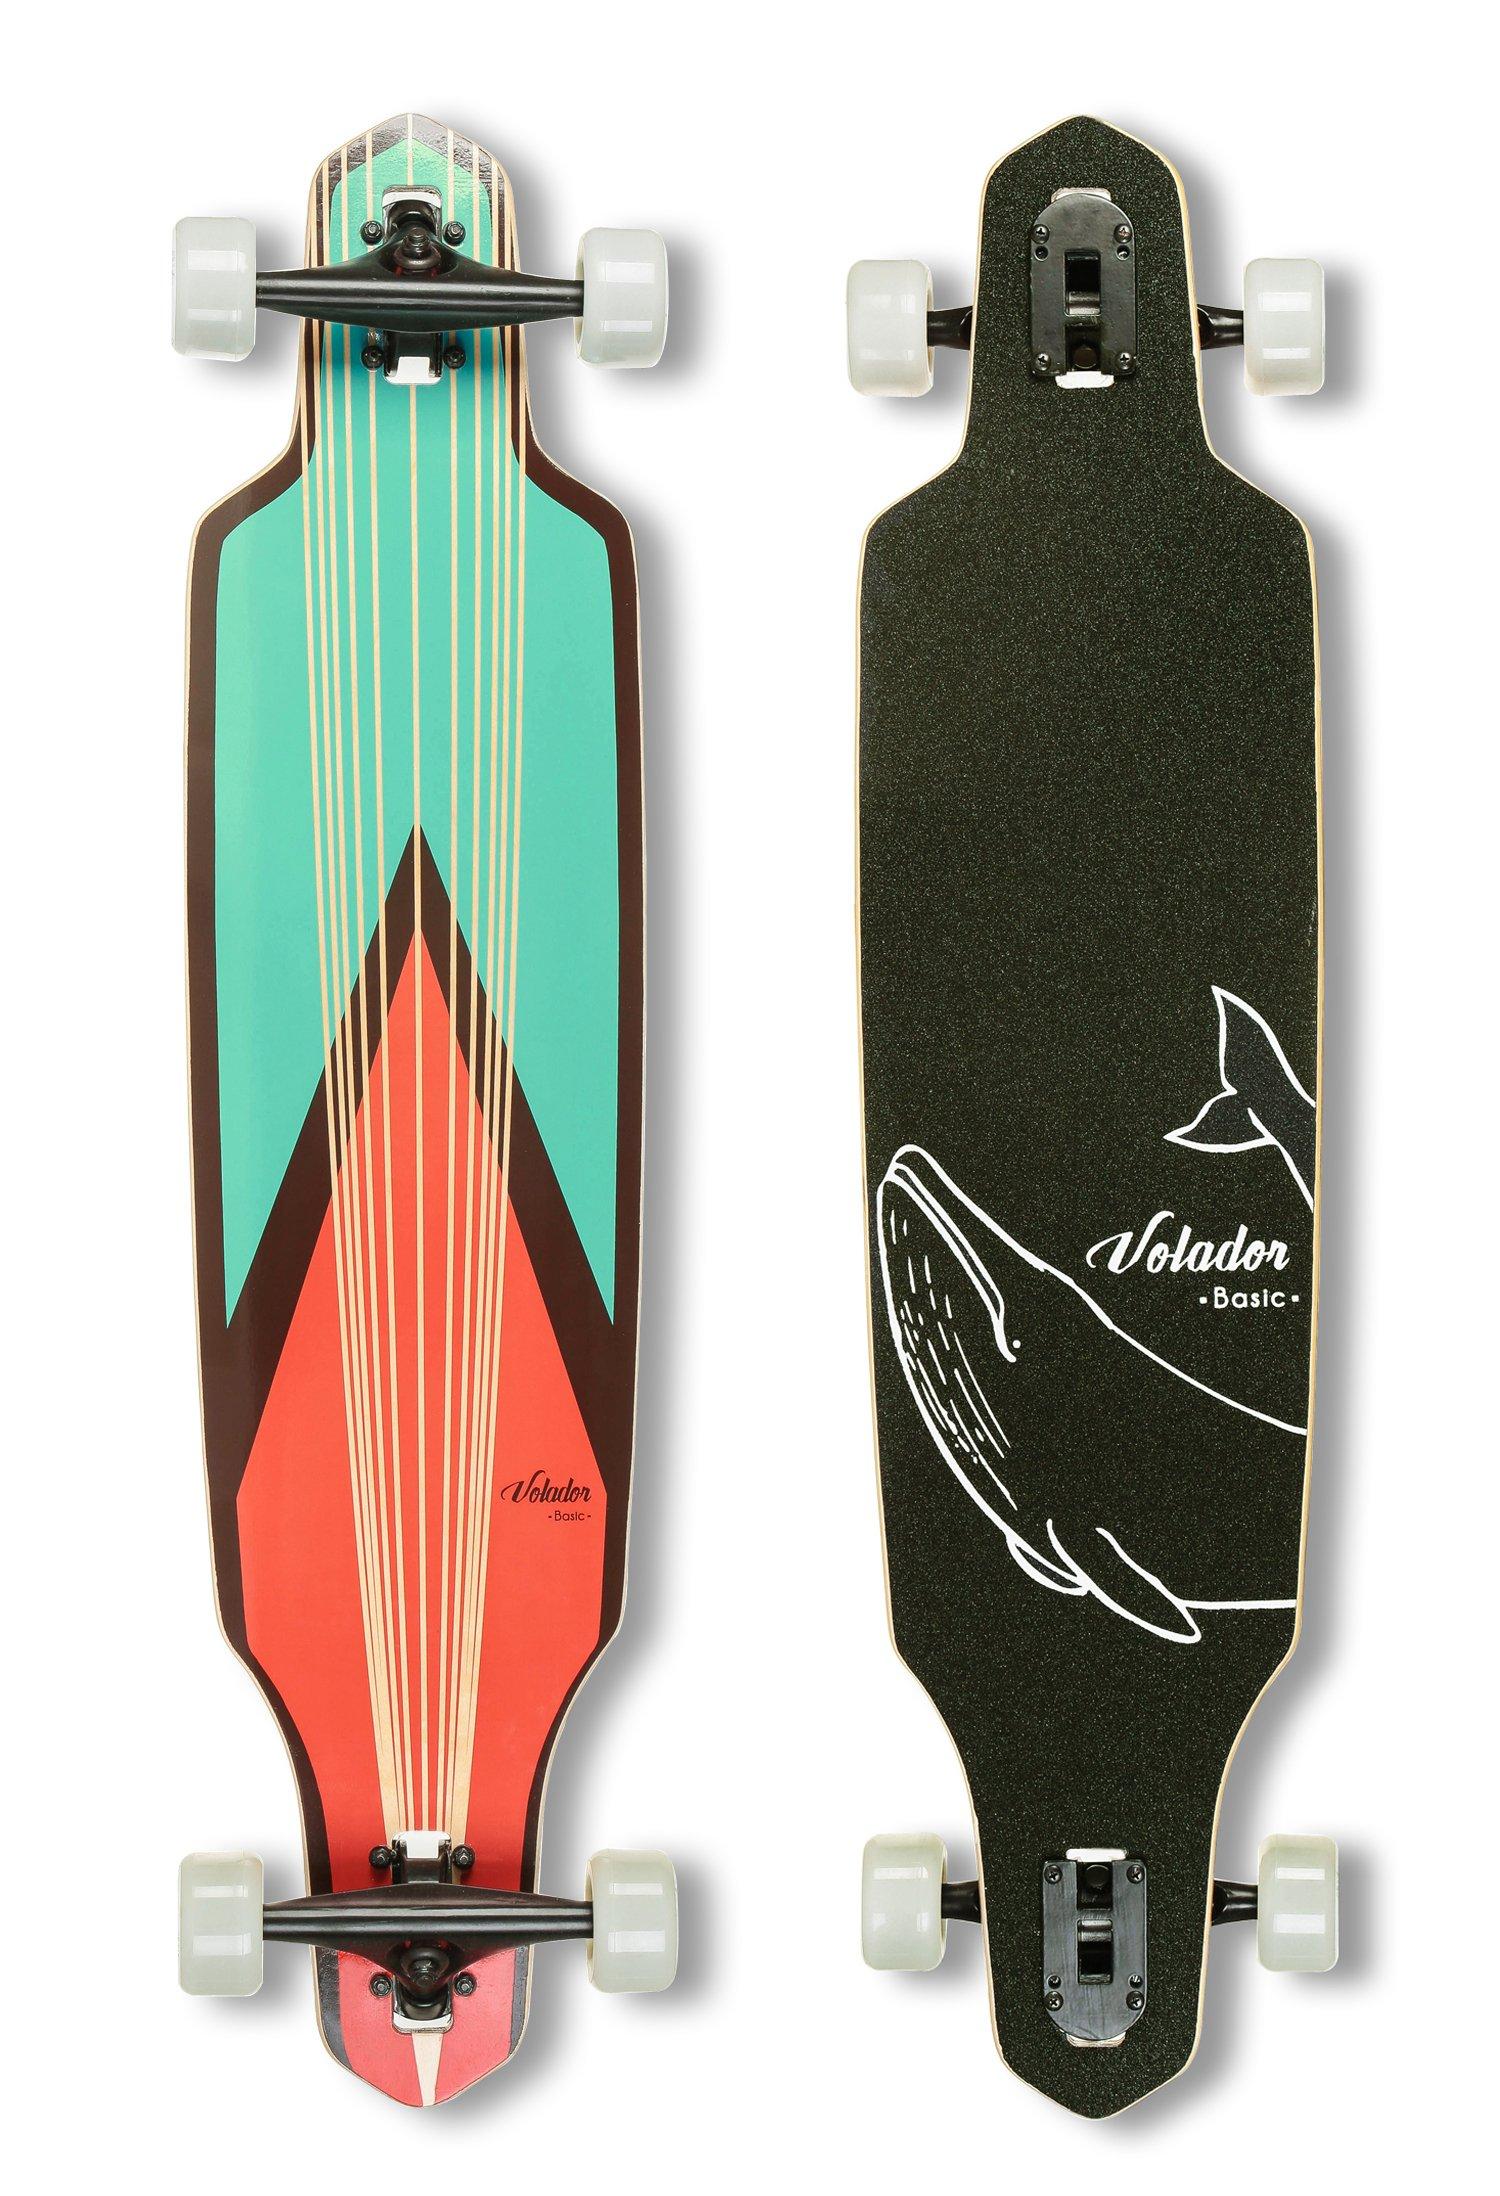 VOLADOR 40inch Maple Longboard - Basic Cruiser (Sword) ...